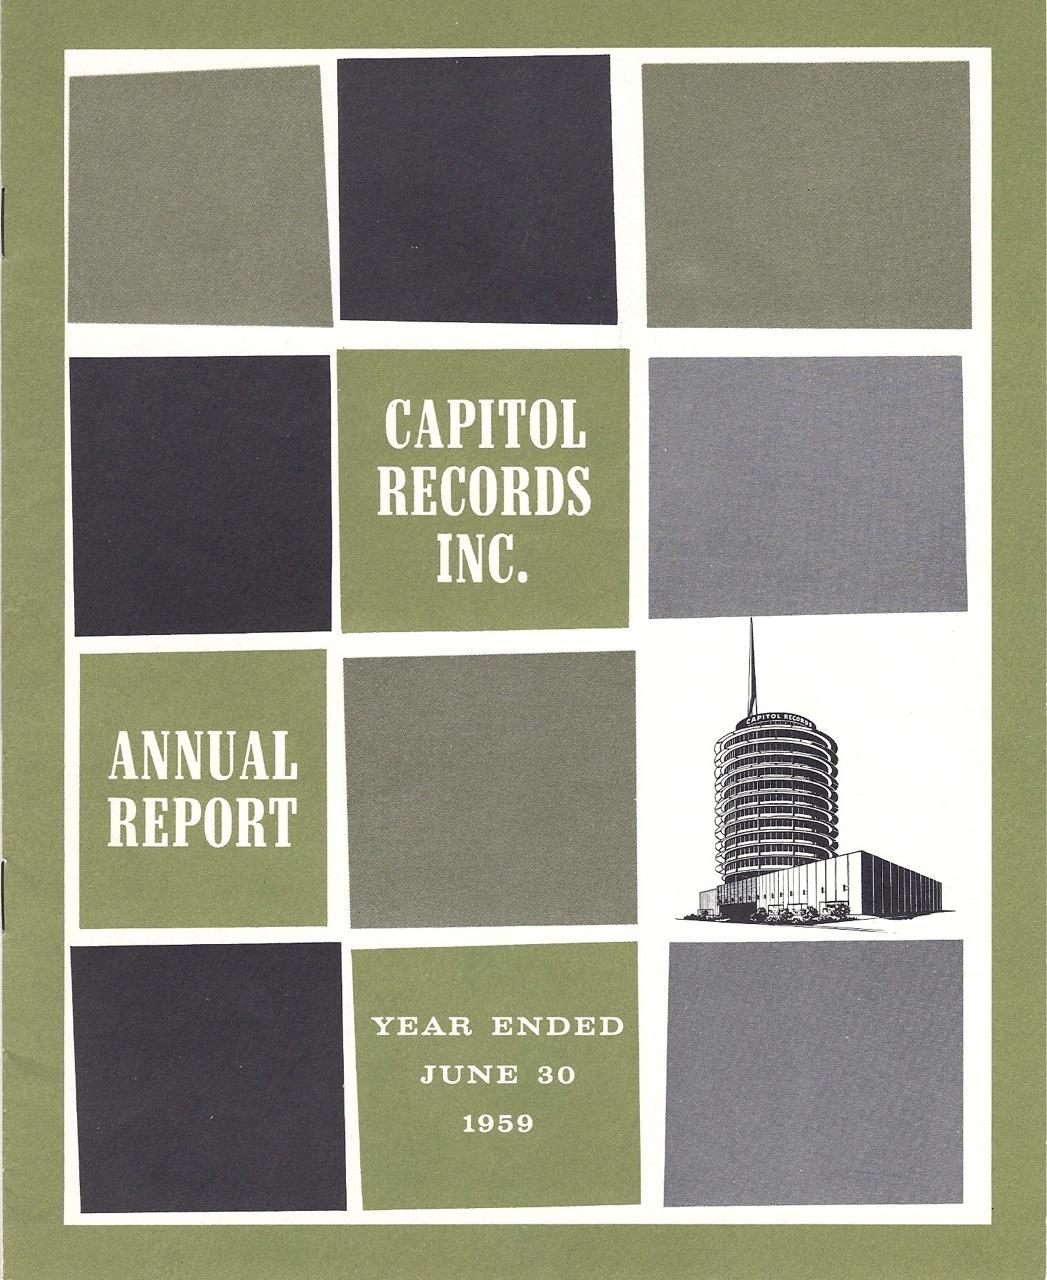 Capitol Records Annual Report 1959